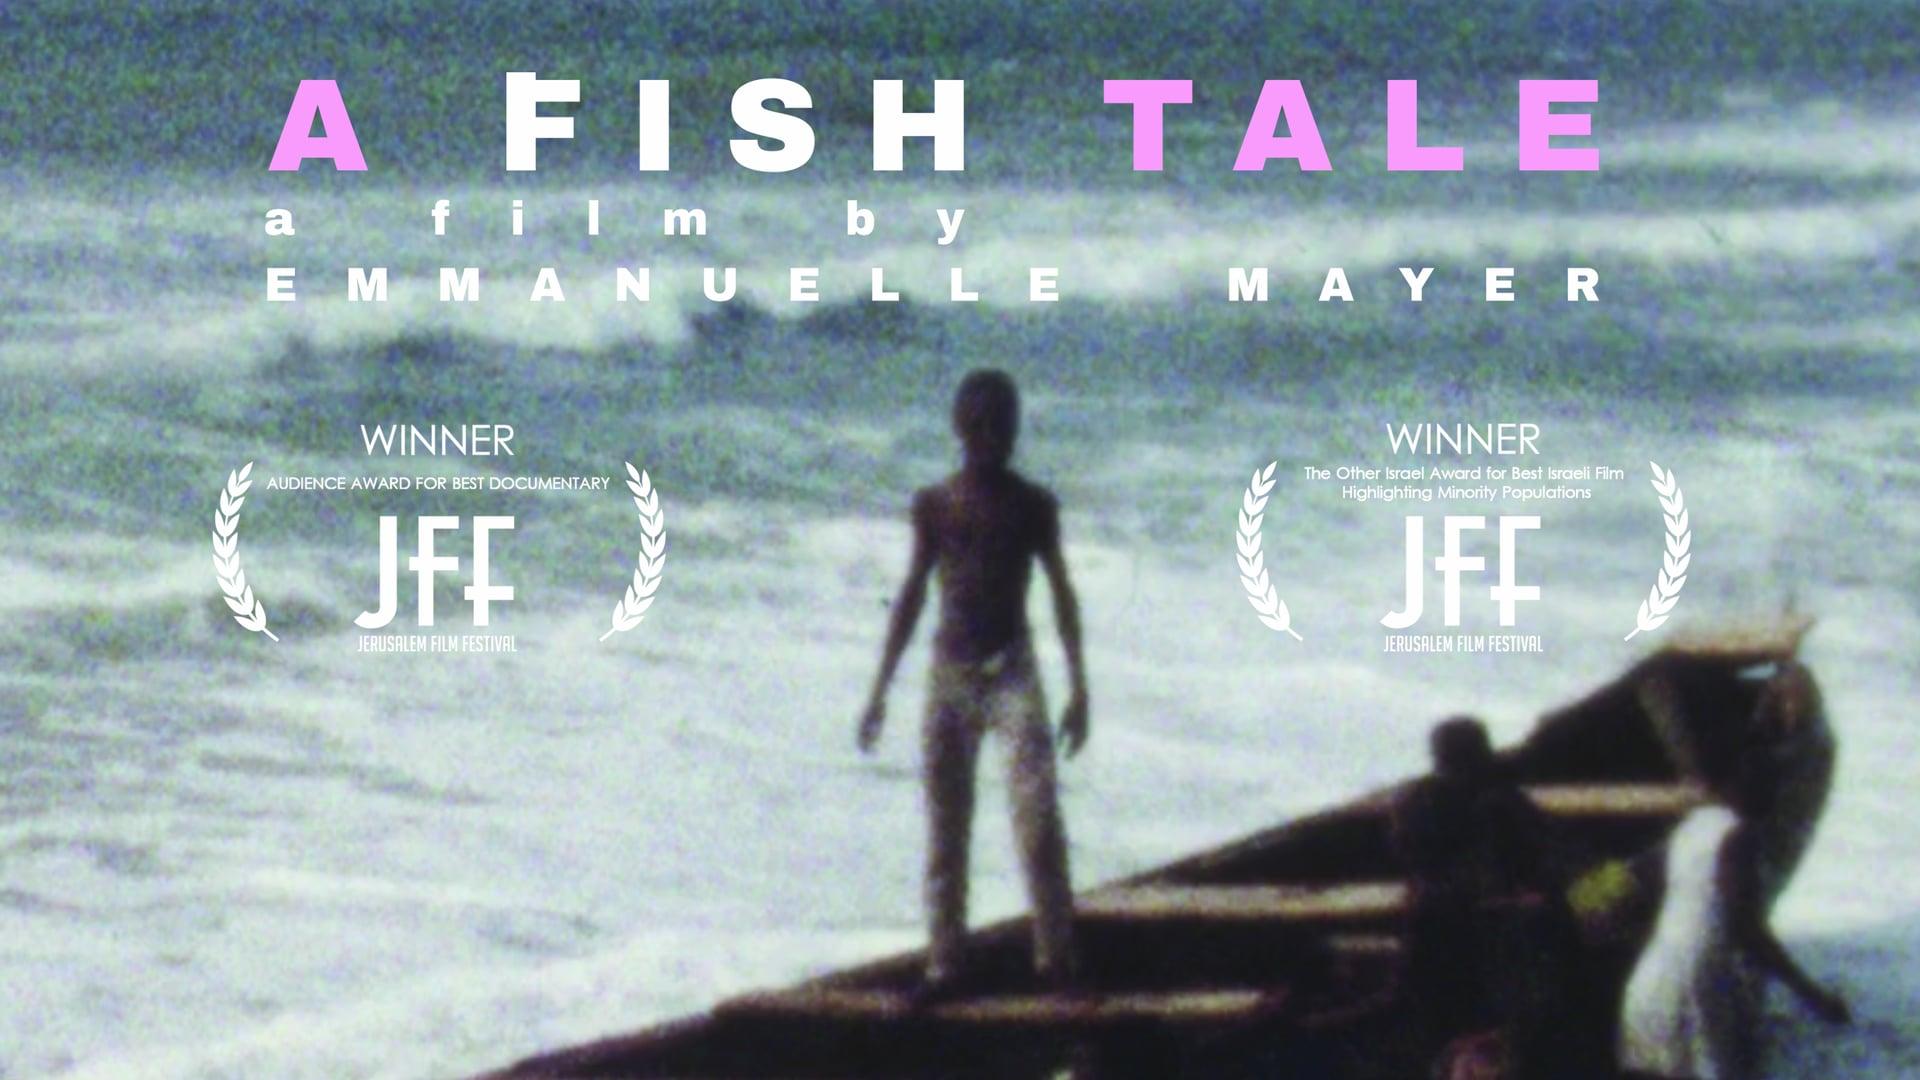 A FISH TALE TRAILER   Soundtrack design